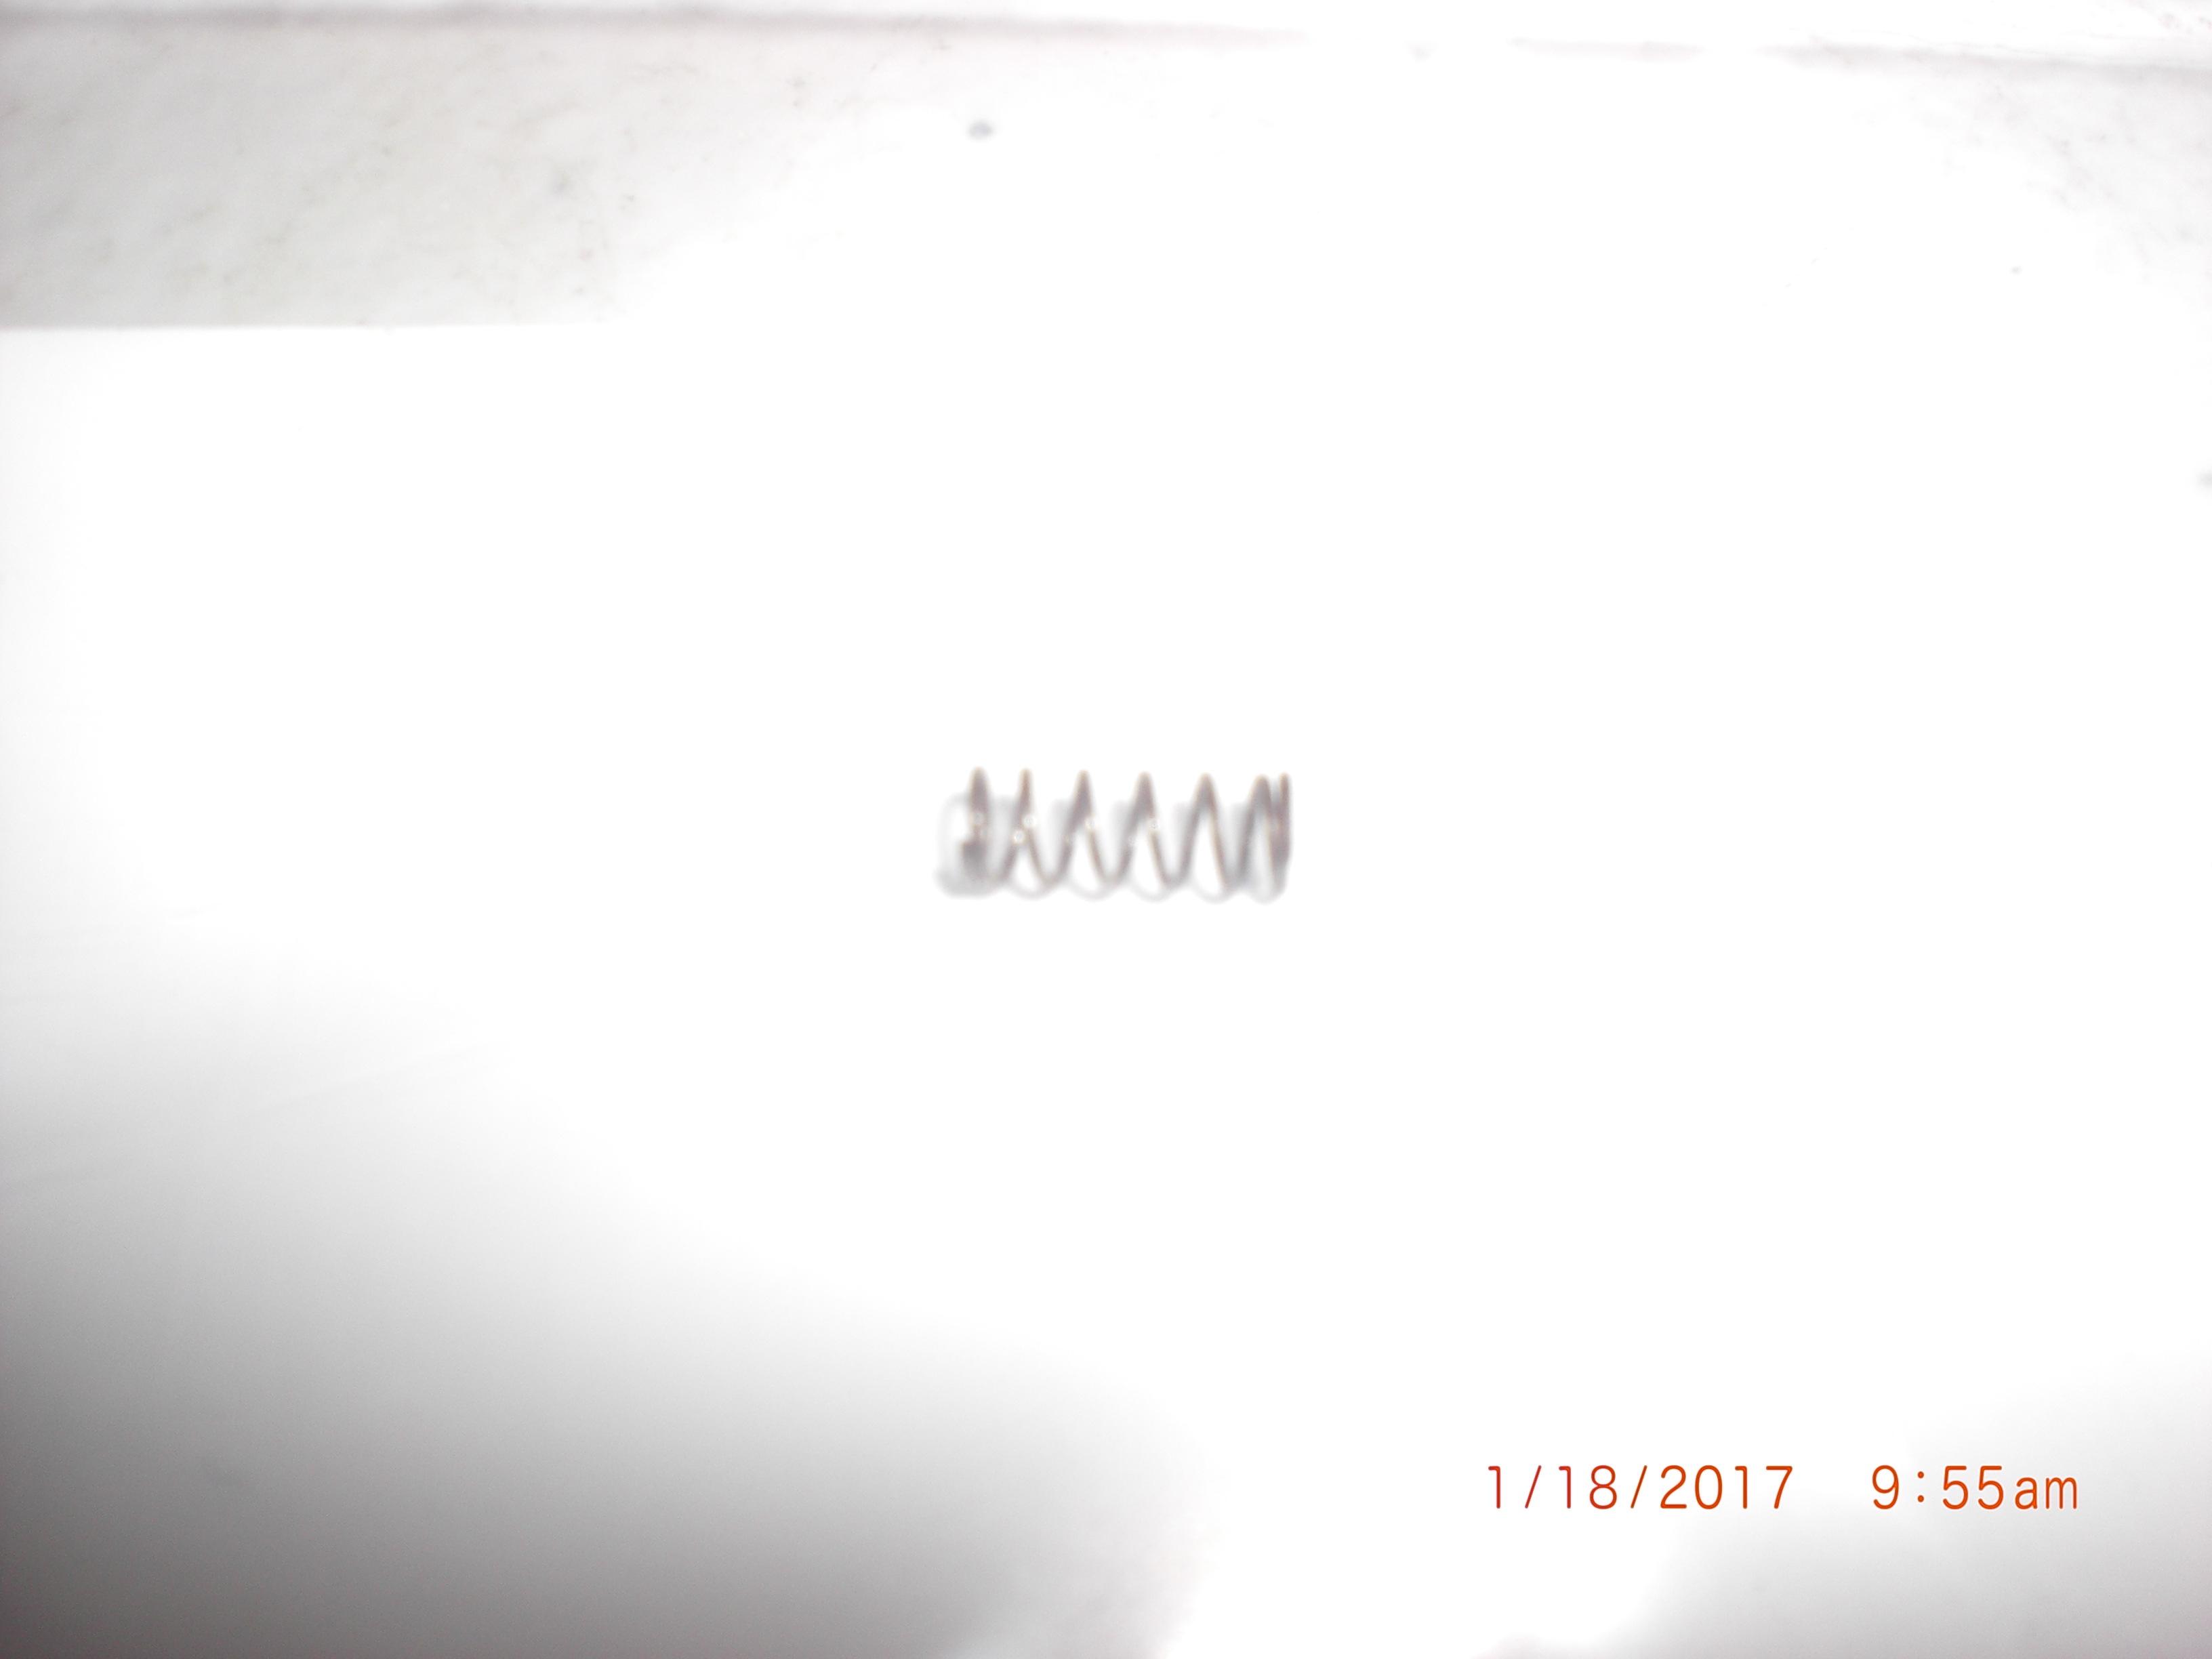 Spring (AMAT) 3780-01215 SPR CPRSN .310FL X .12OD X .014W-DIA MUS